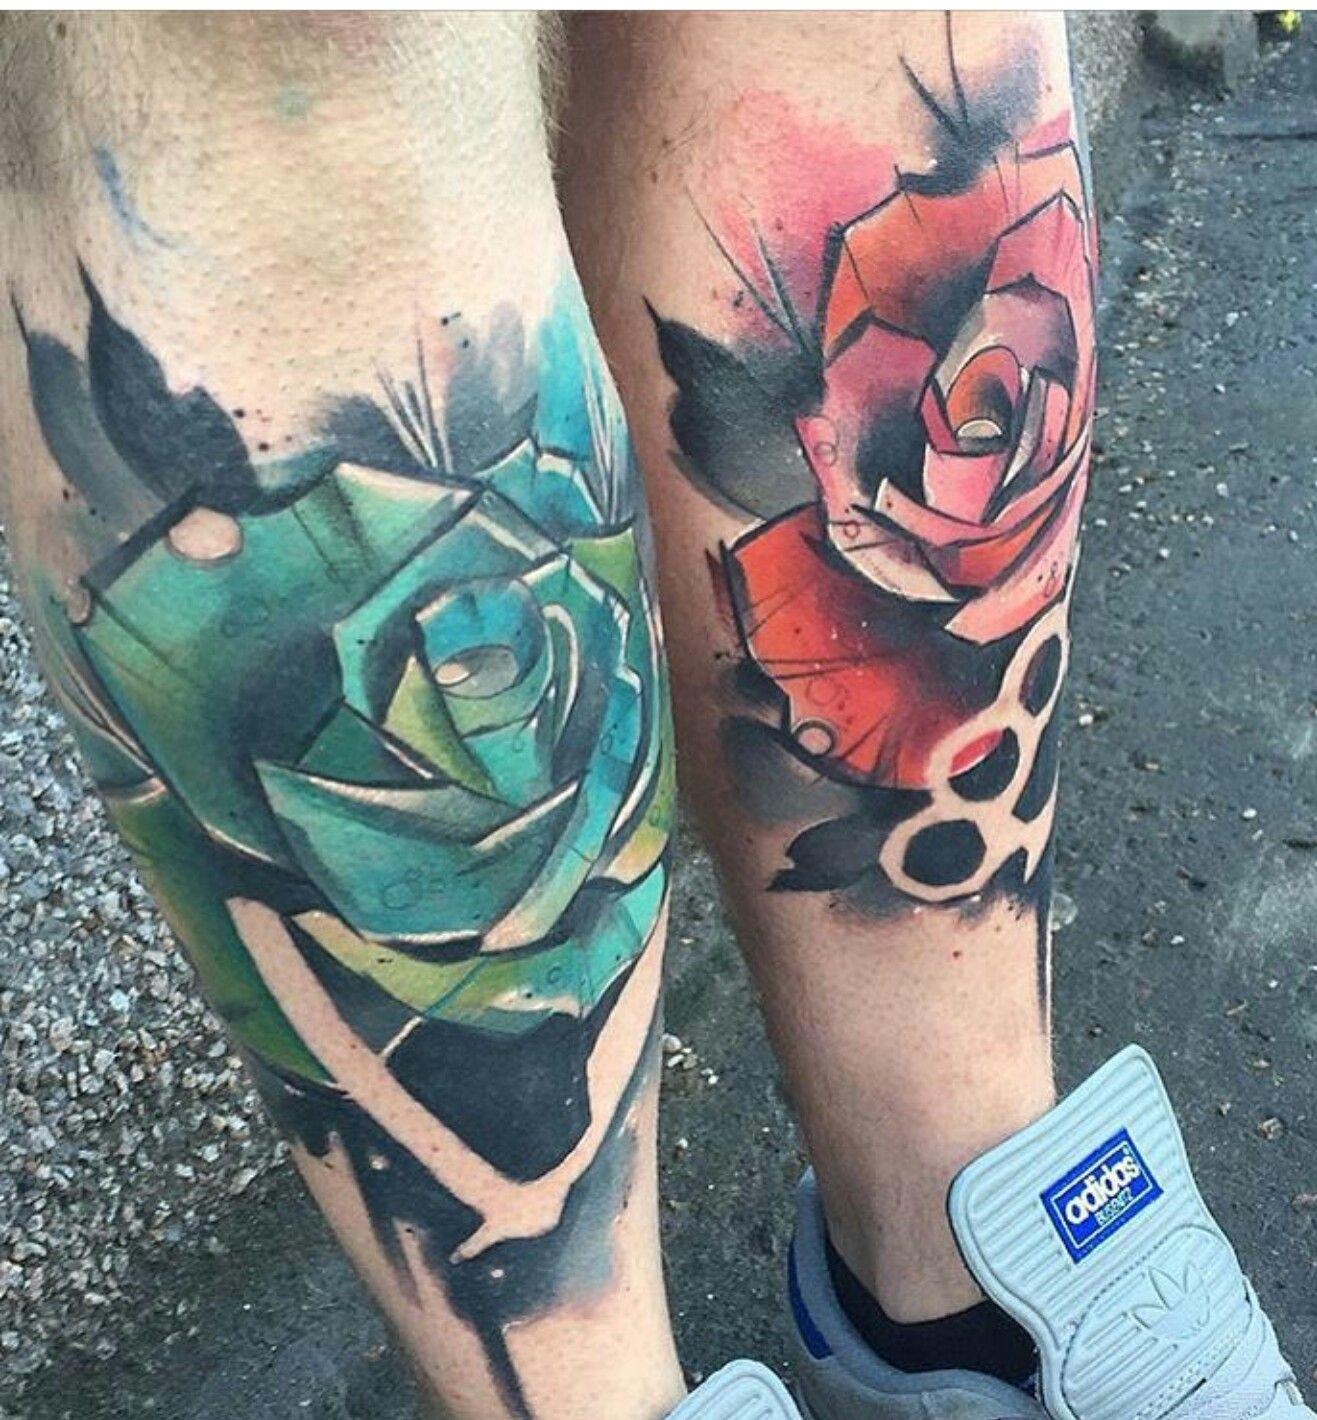 Tattoo Meaning Razor: Brass Knuckles & Straight Razor